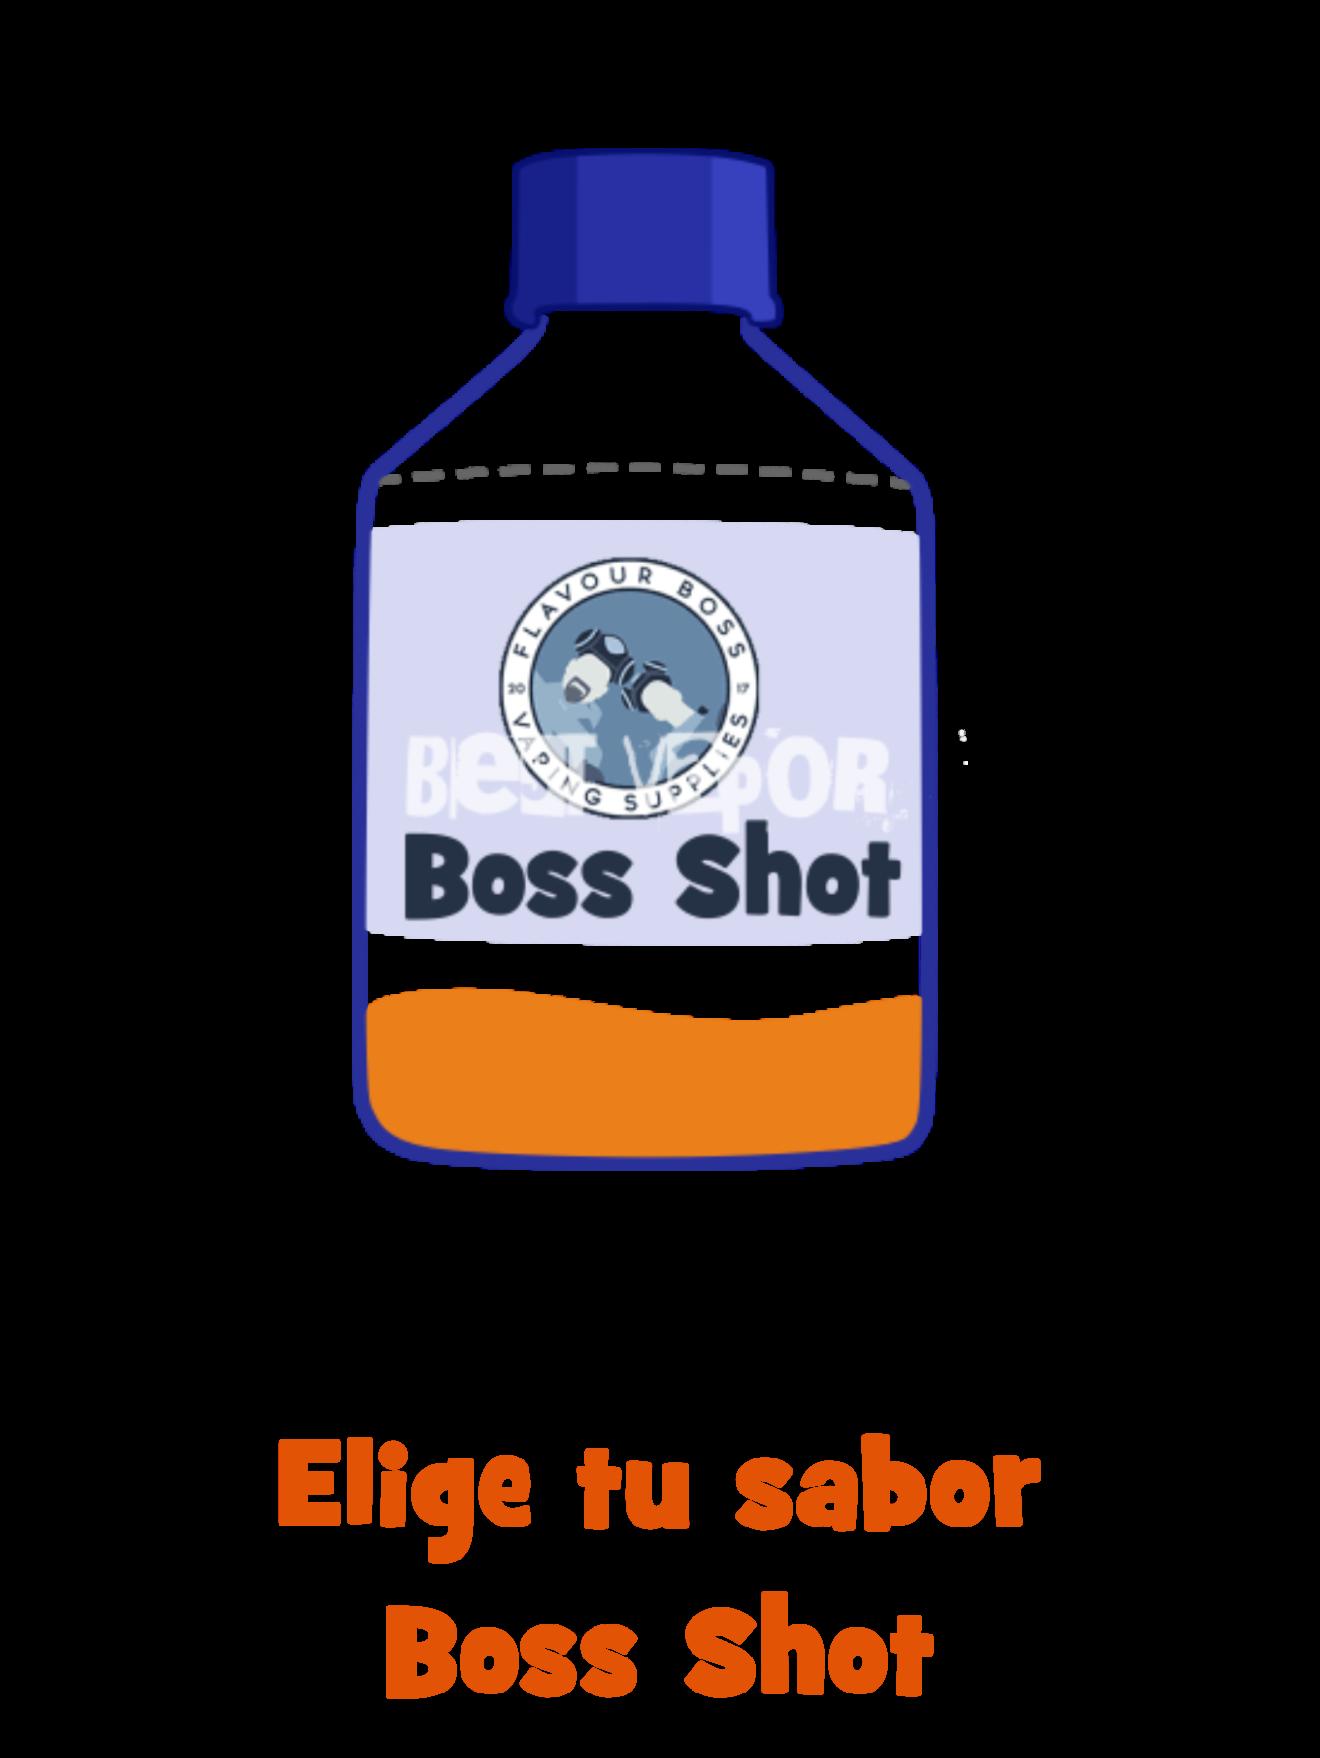 Elige tu sabor Boss Shot de Best Vapor